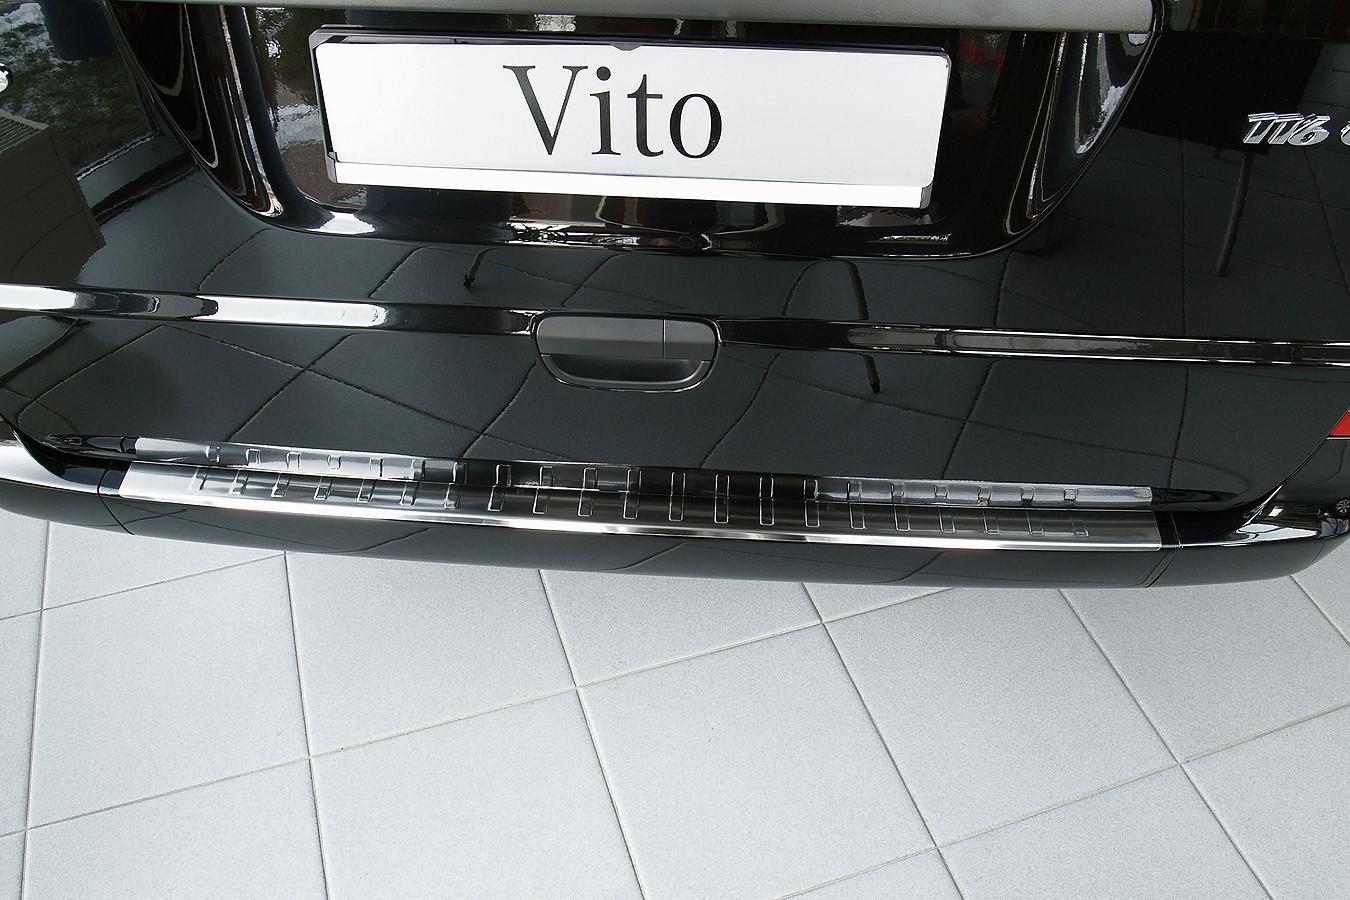 acier inox protection pare choc pour mercedes vito viano. Black Bedroom Furniture Sets. Home Design Ideas